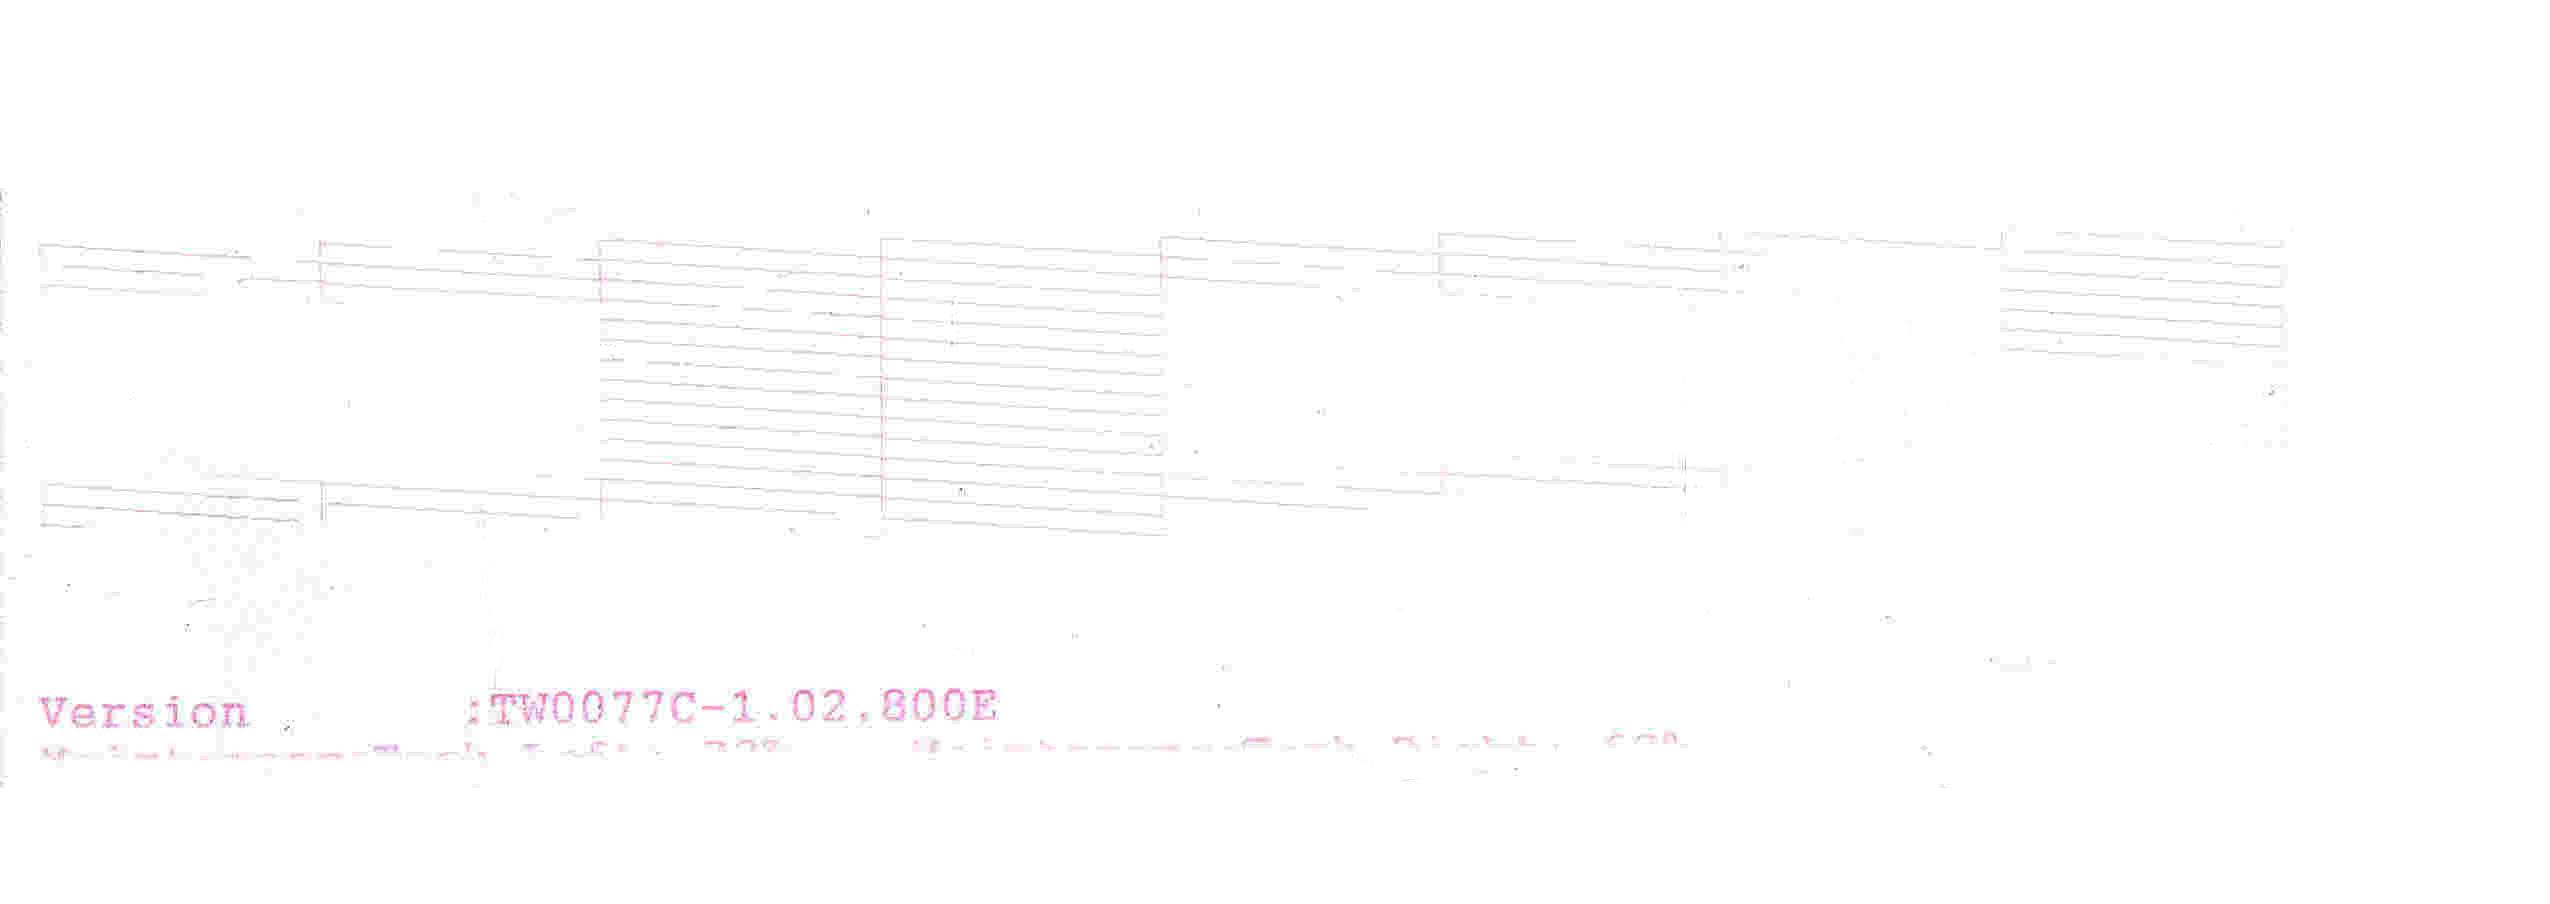 RicohC51008477b